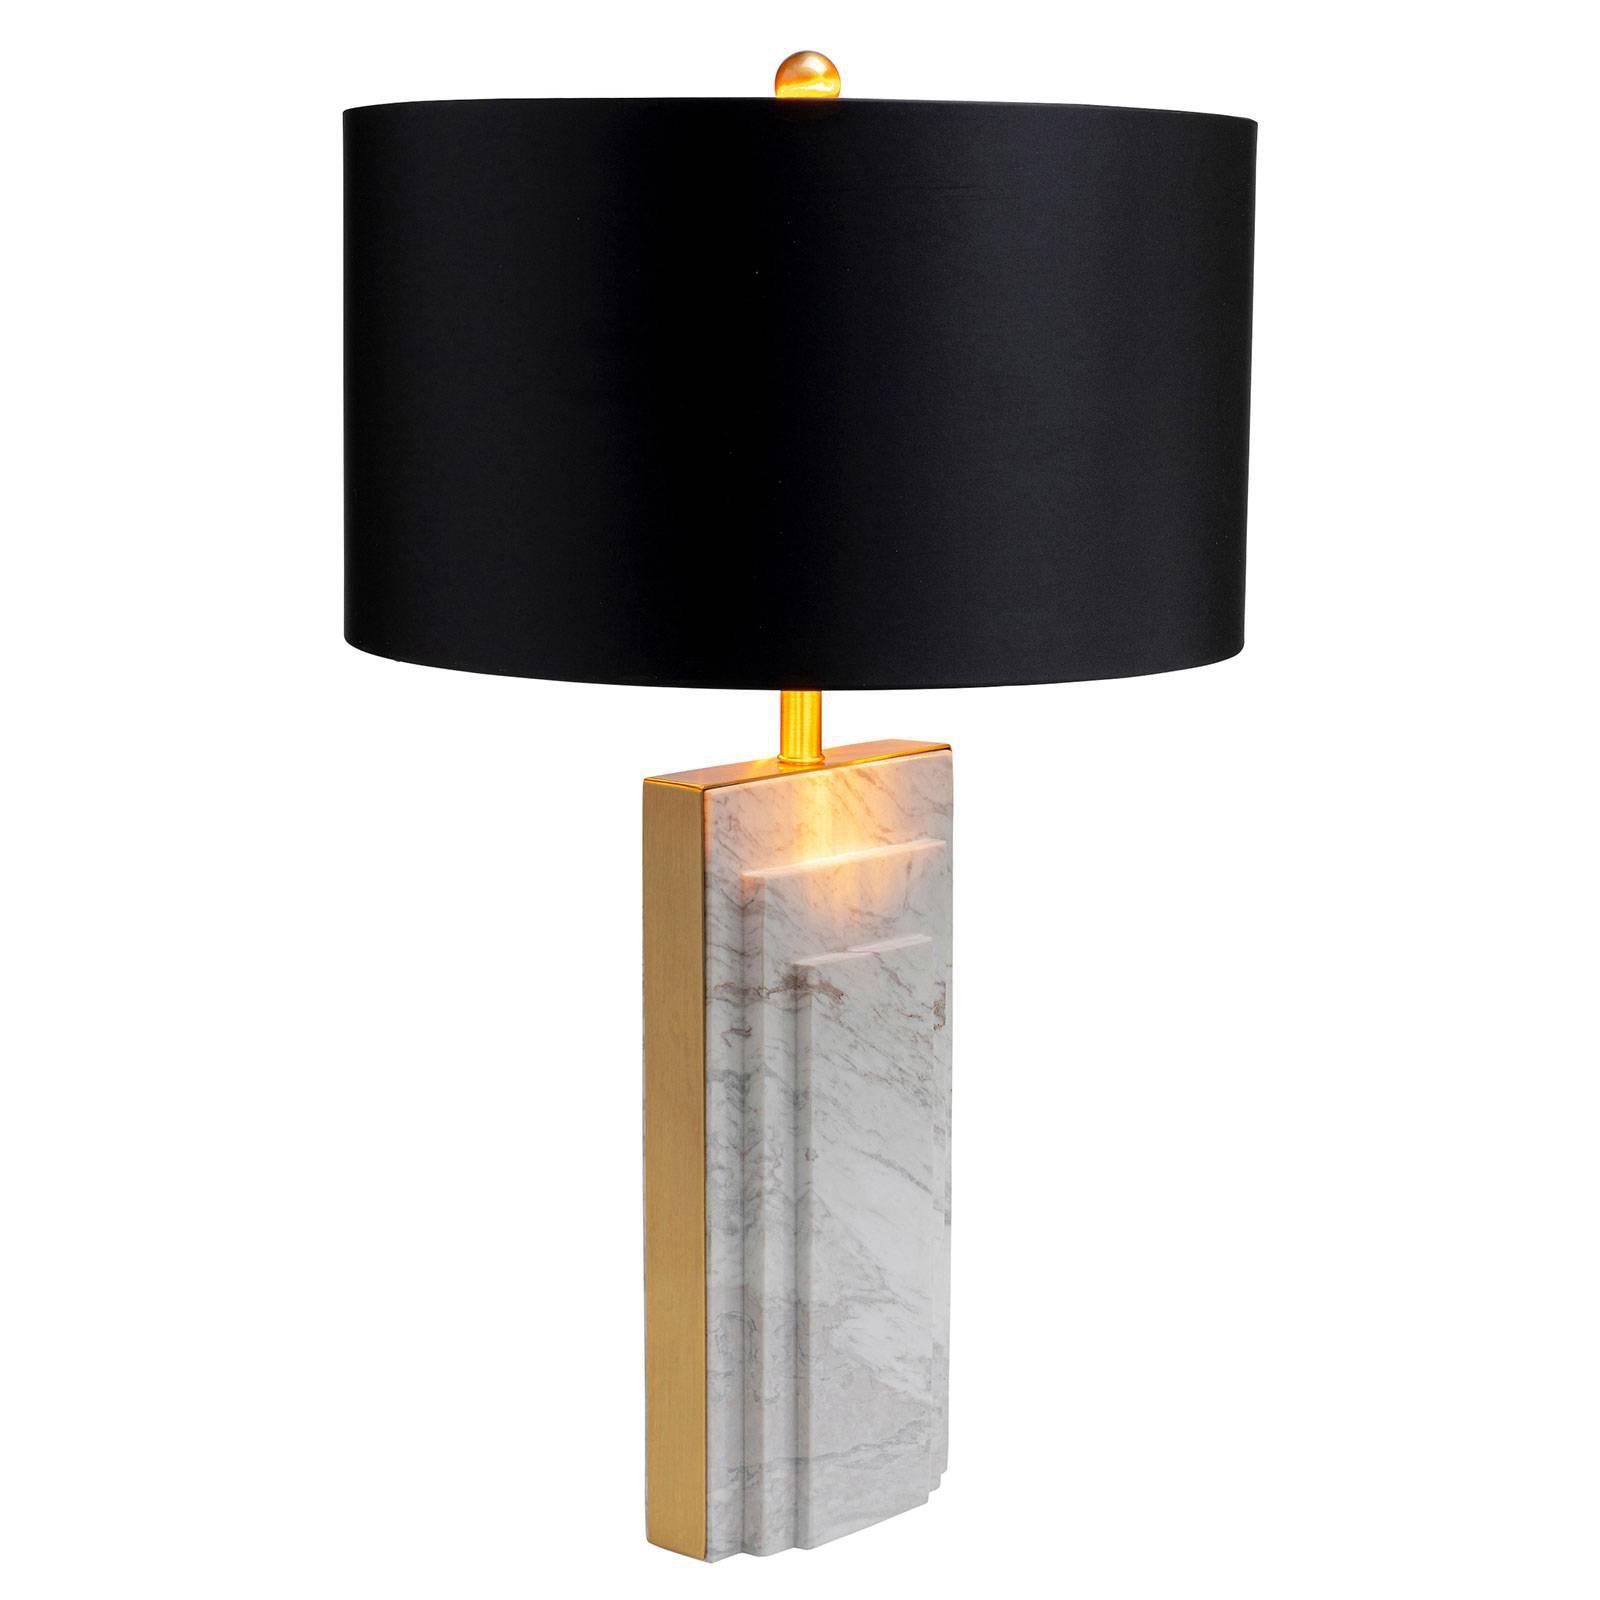 KARE Rumba Marble bordlampe marmor, hvit